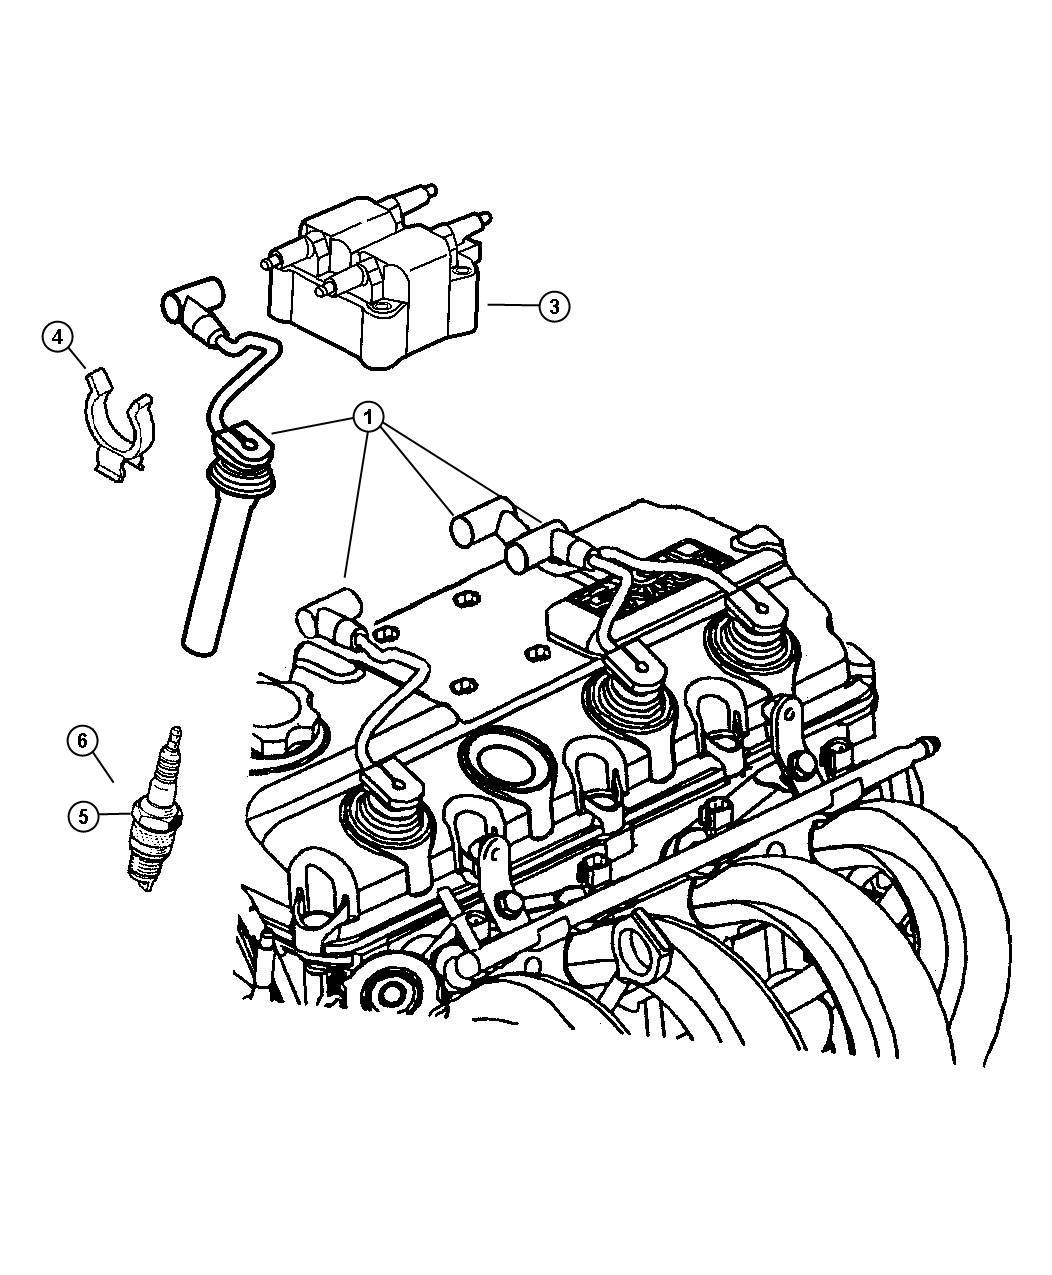 Chrysler Pt Cruiser Spark plug. Re-14mc-c5. Up to 11/27/03